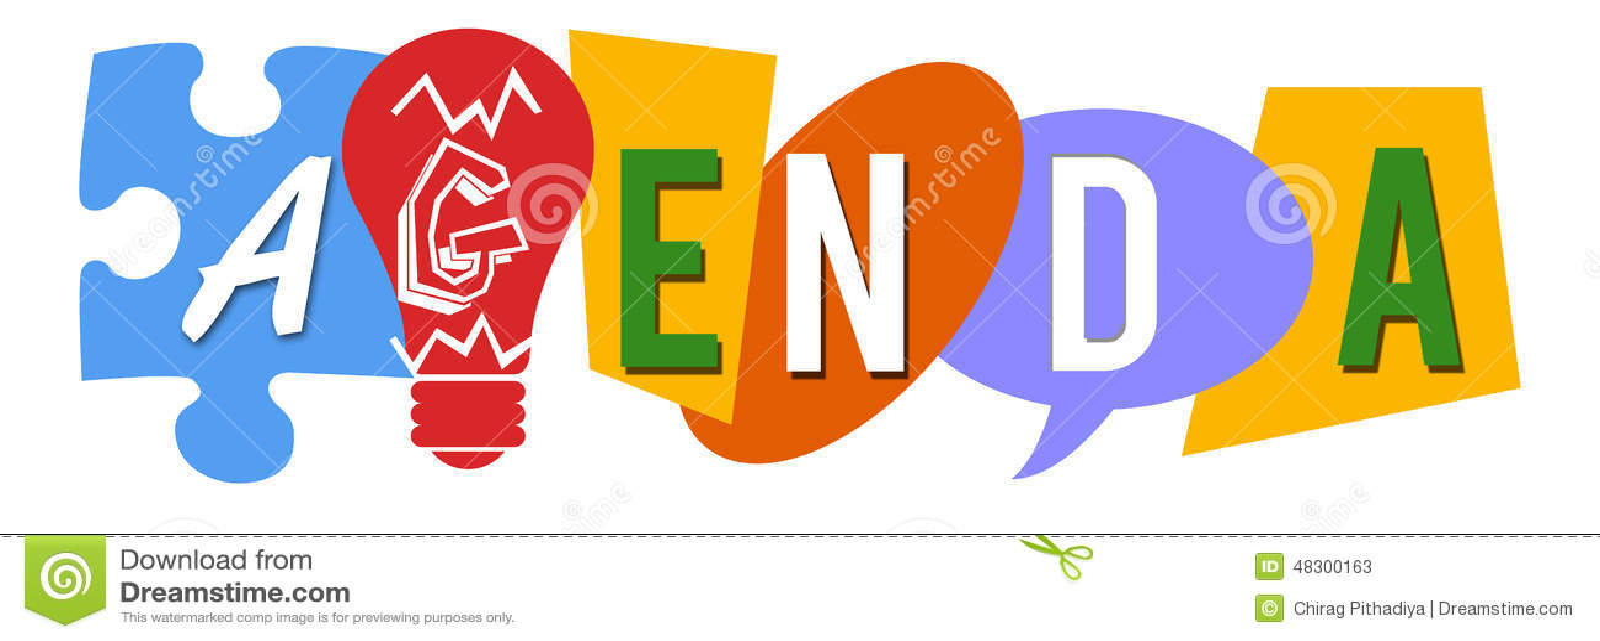 Agenda Various Colorful Shapes Stock Illustration - Illustration of